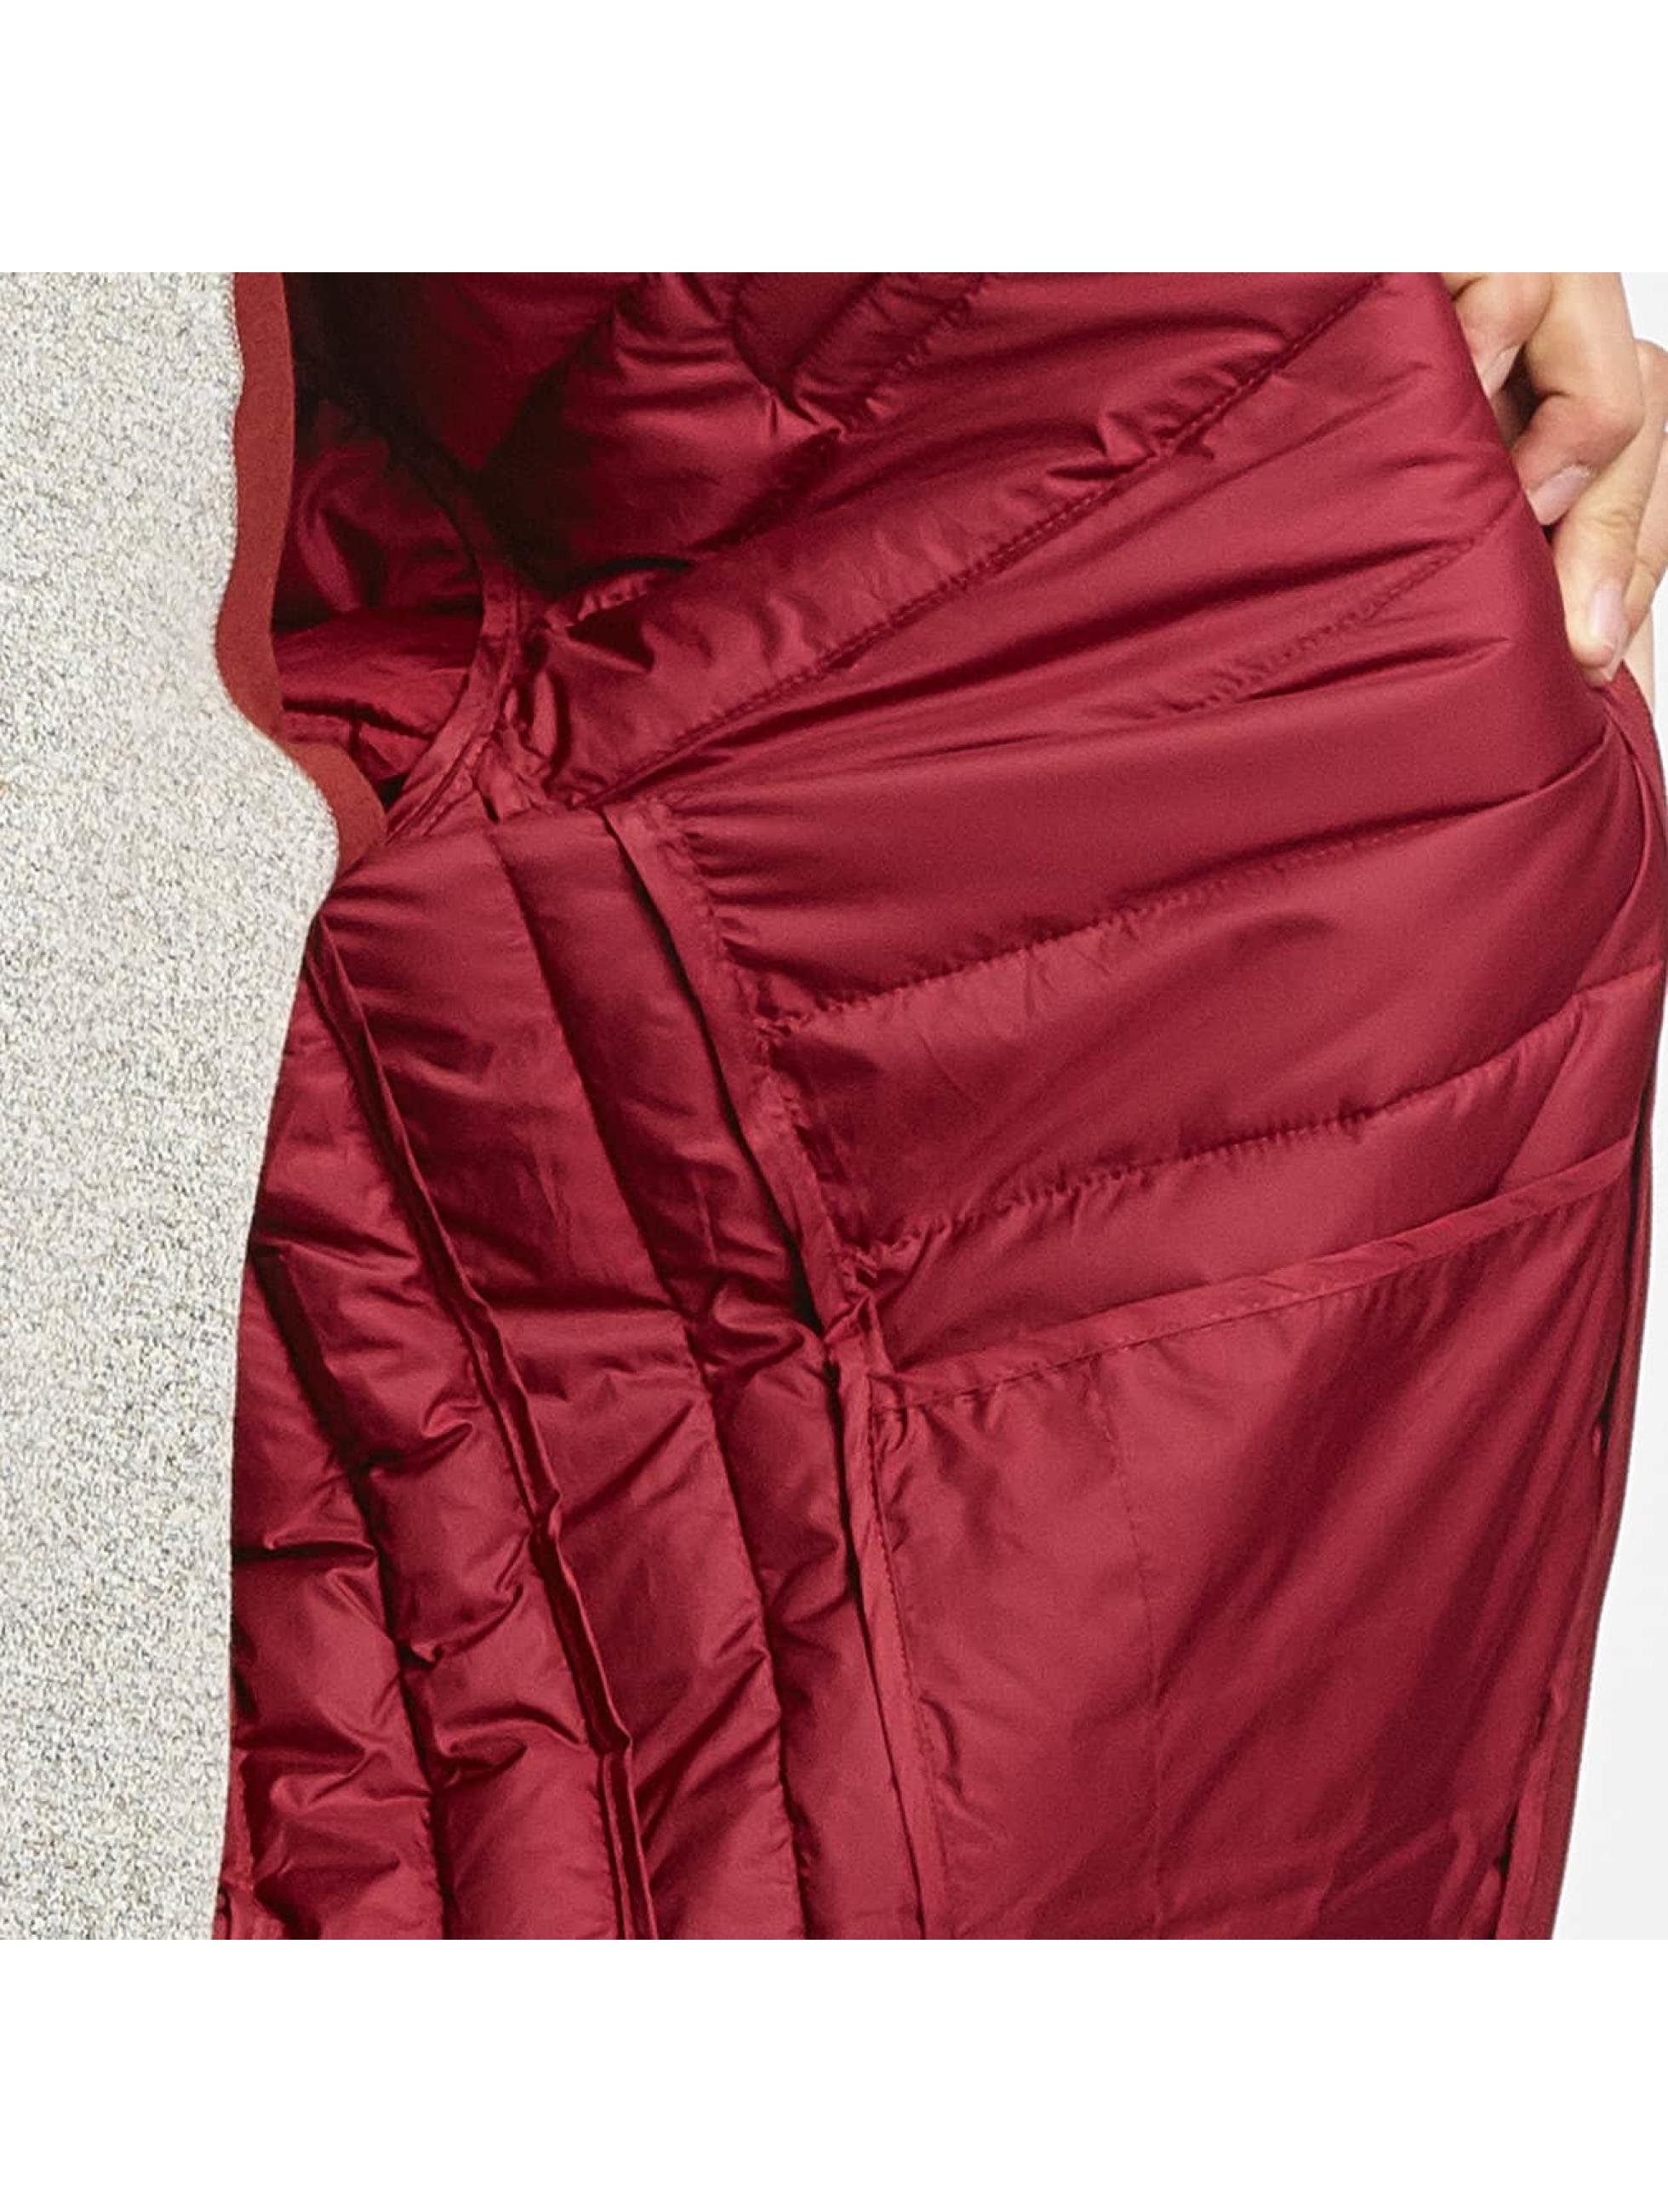 Ellesse Chaqueta de entretiempo Lombardy Padded rojo